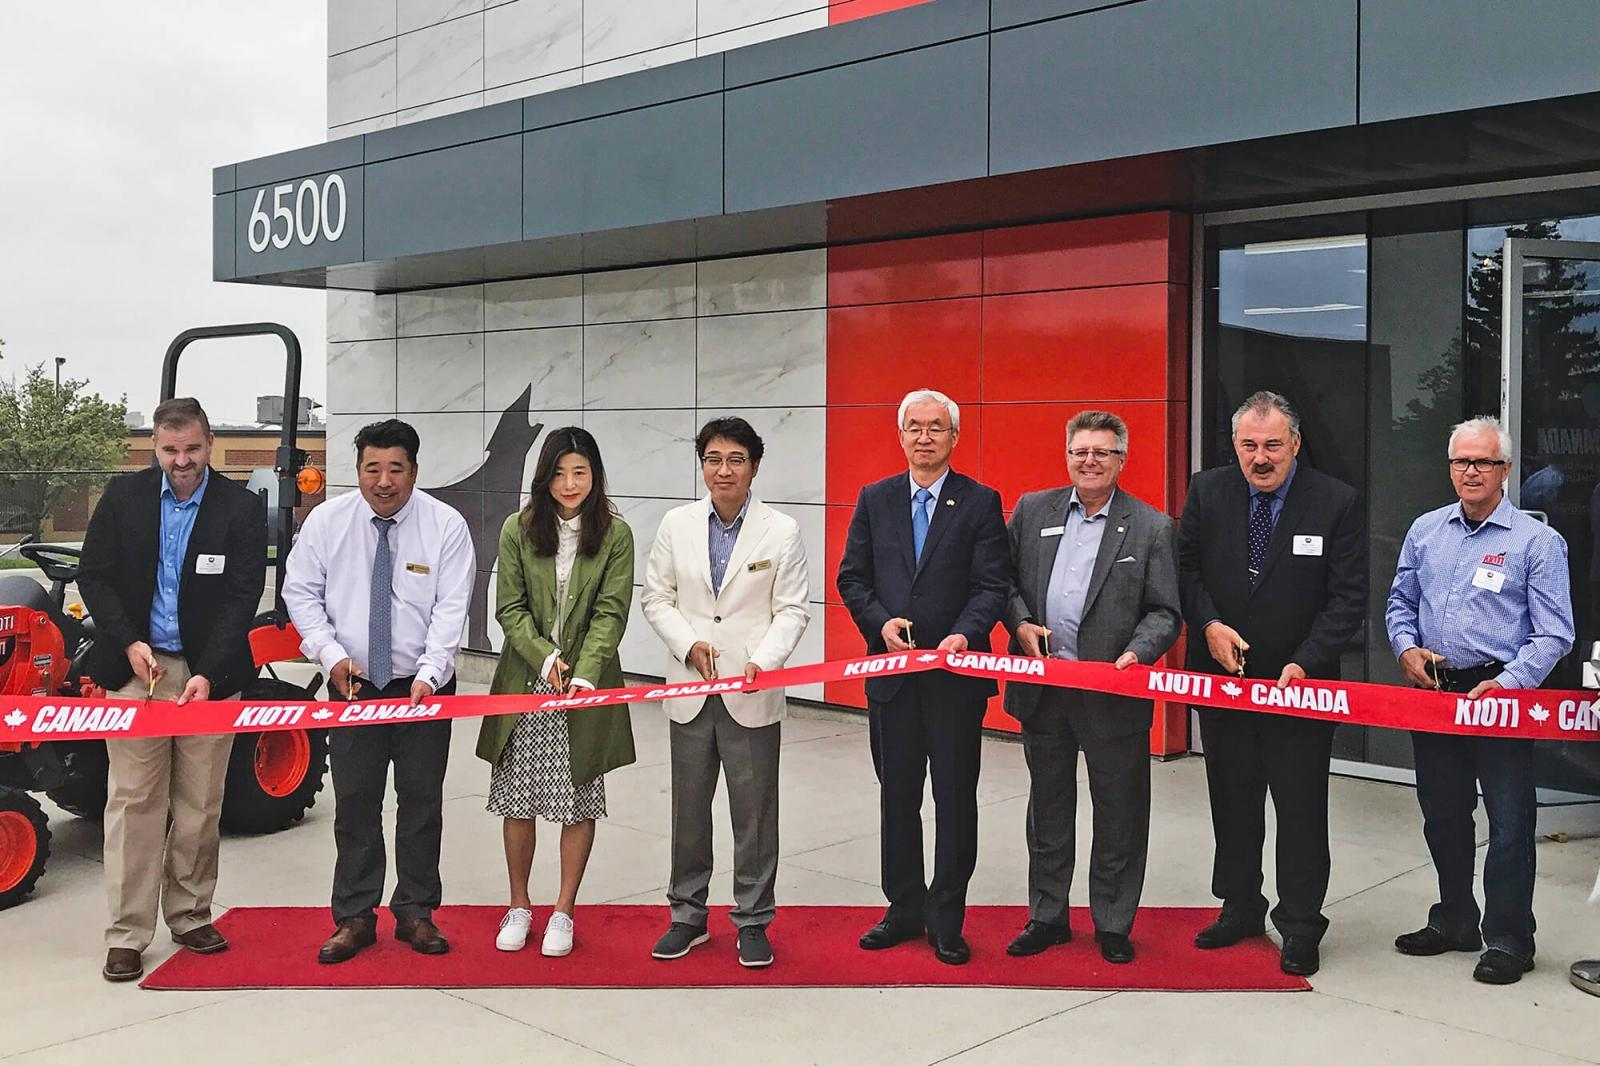 Kioti opens distribution centre